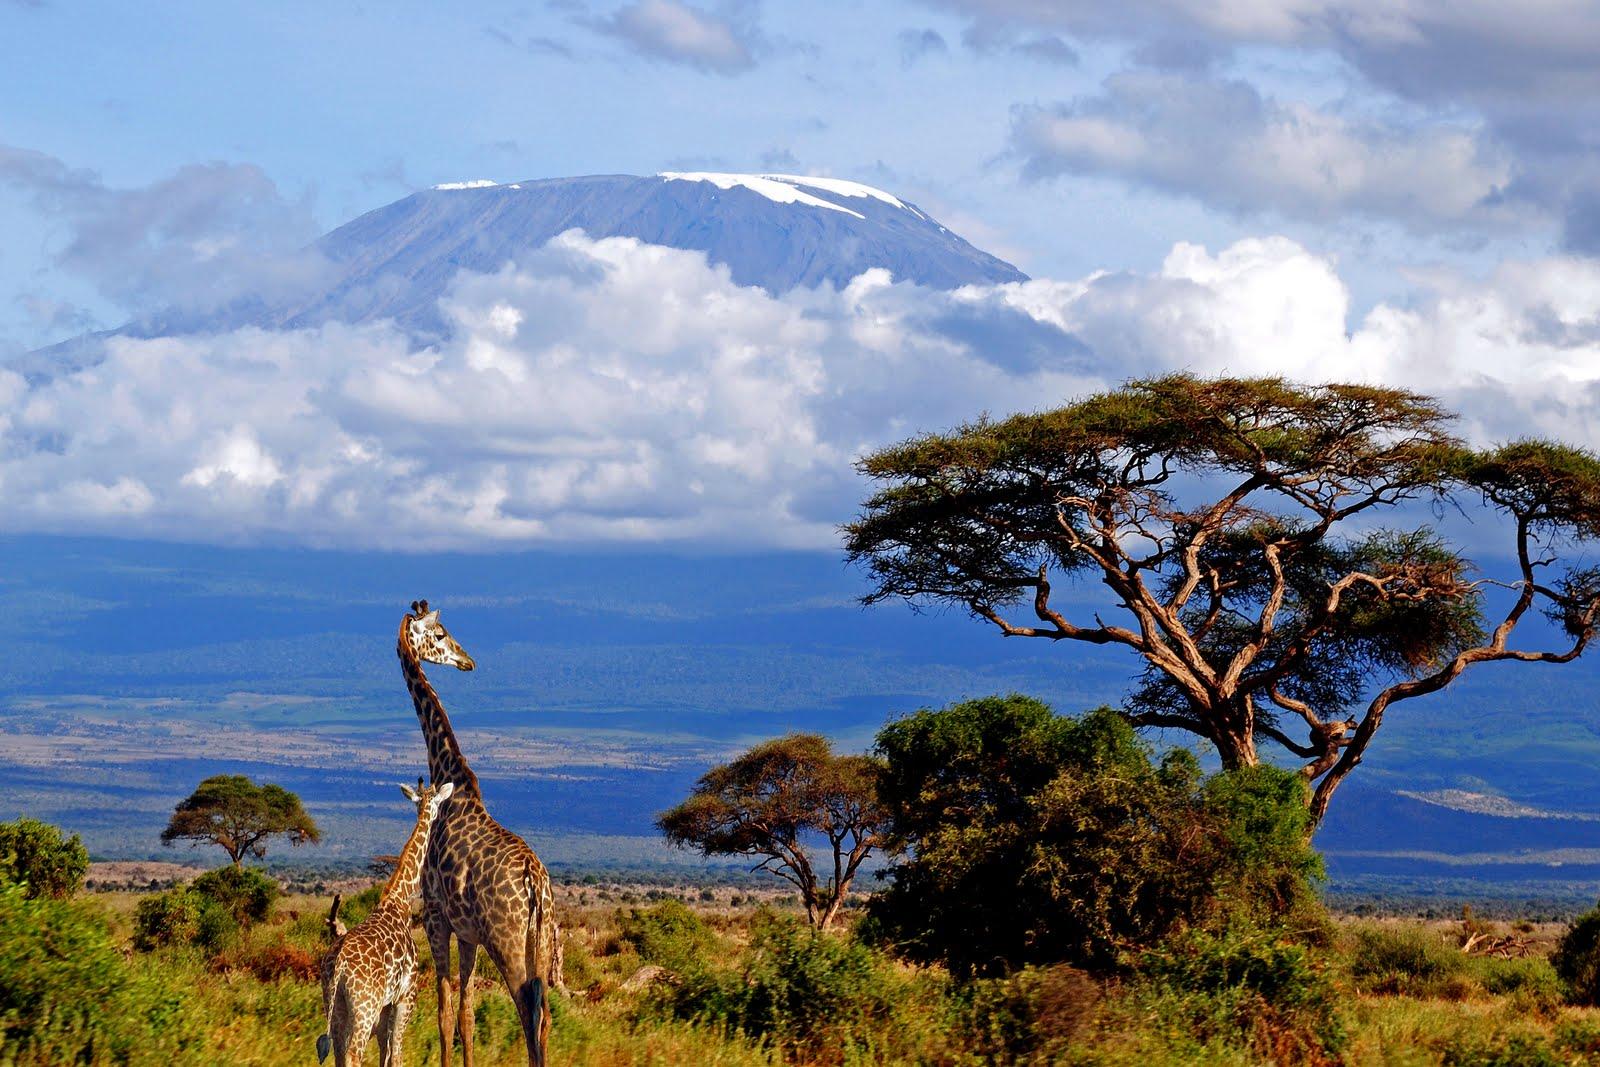 Mt-Kilimanjaro-natural-wonders